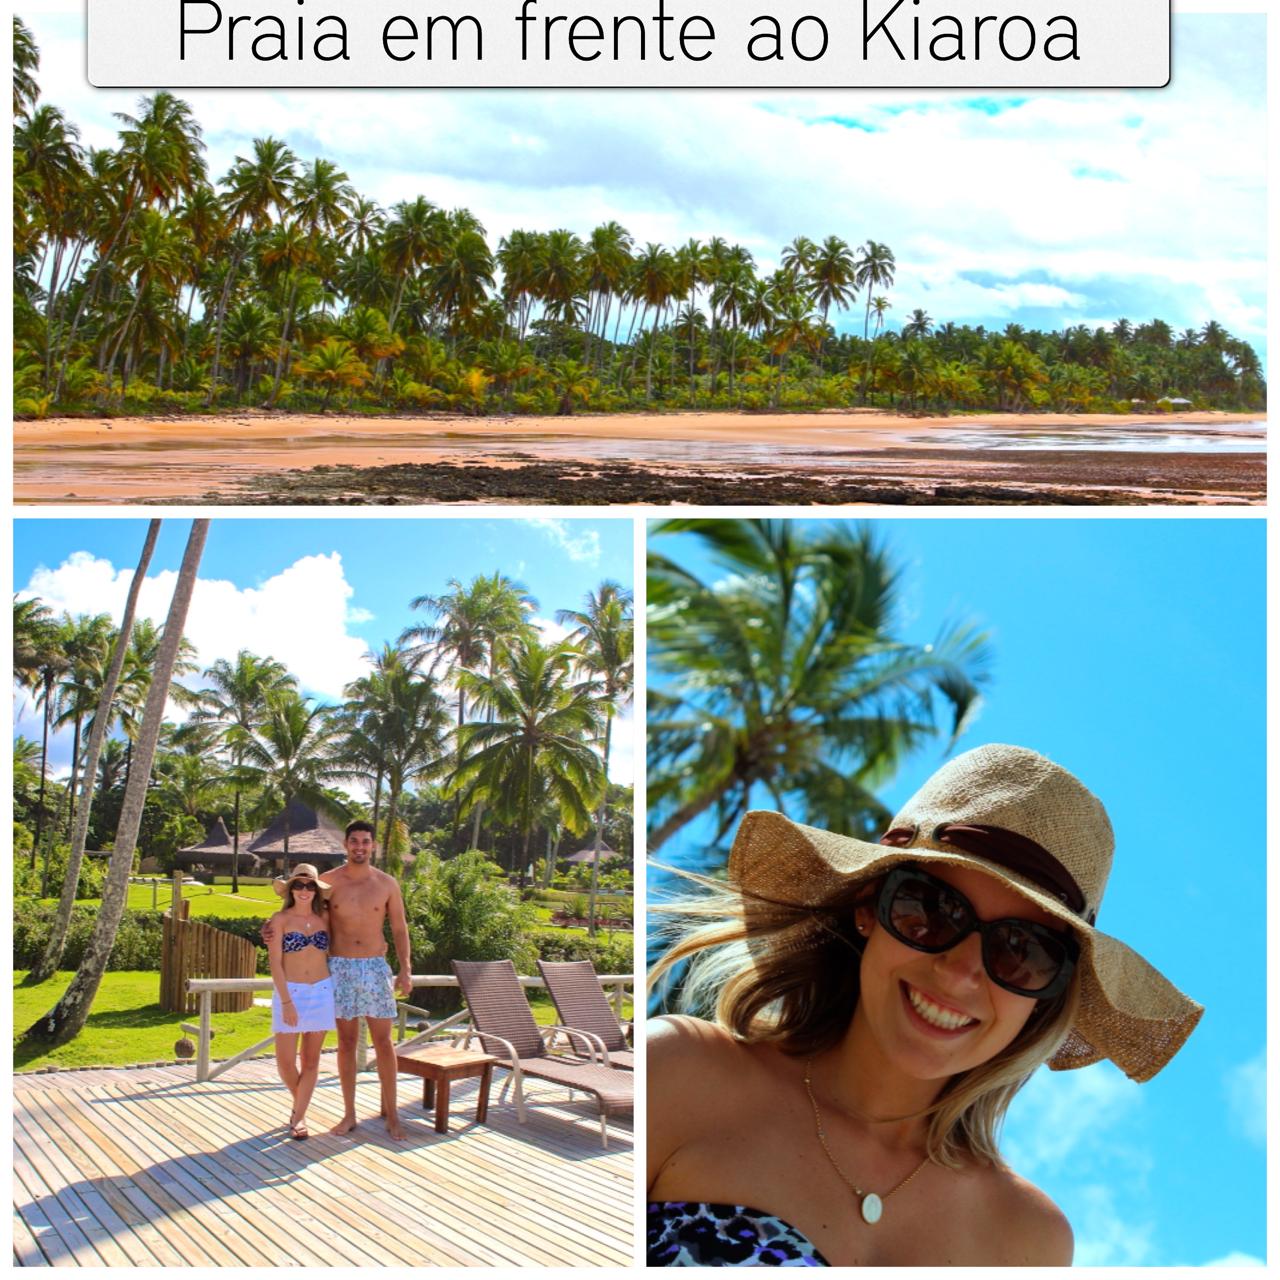 praia_kiaroa_do_pao_ao_caviar